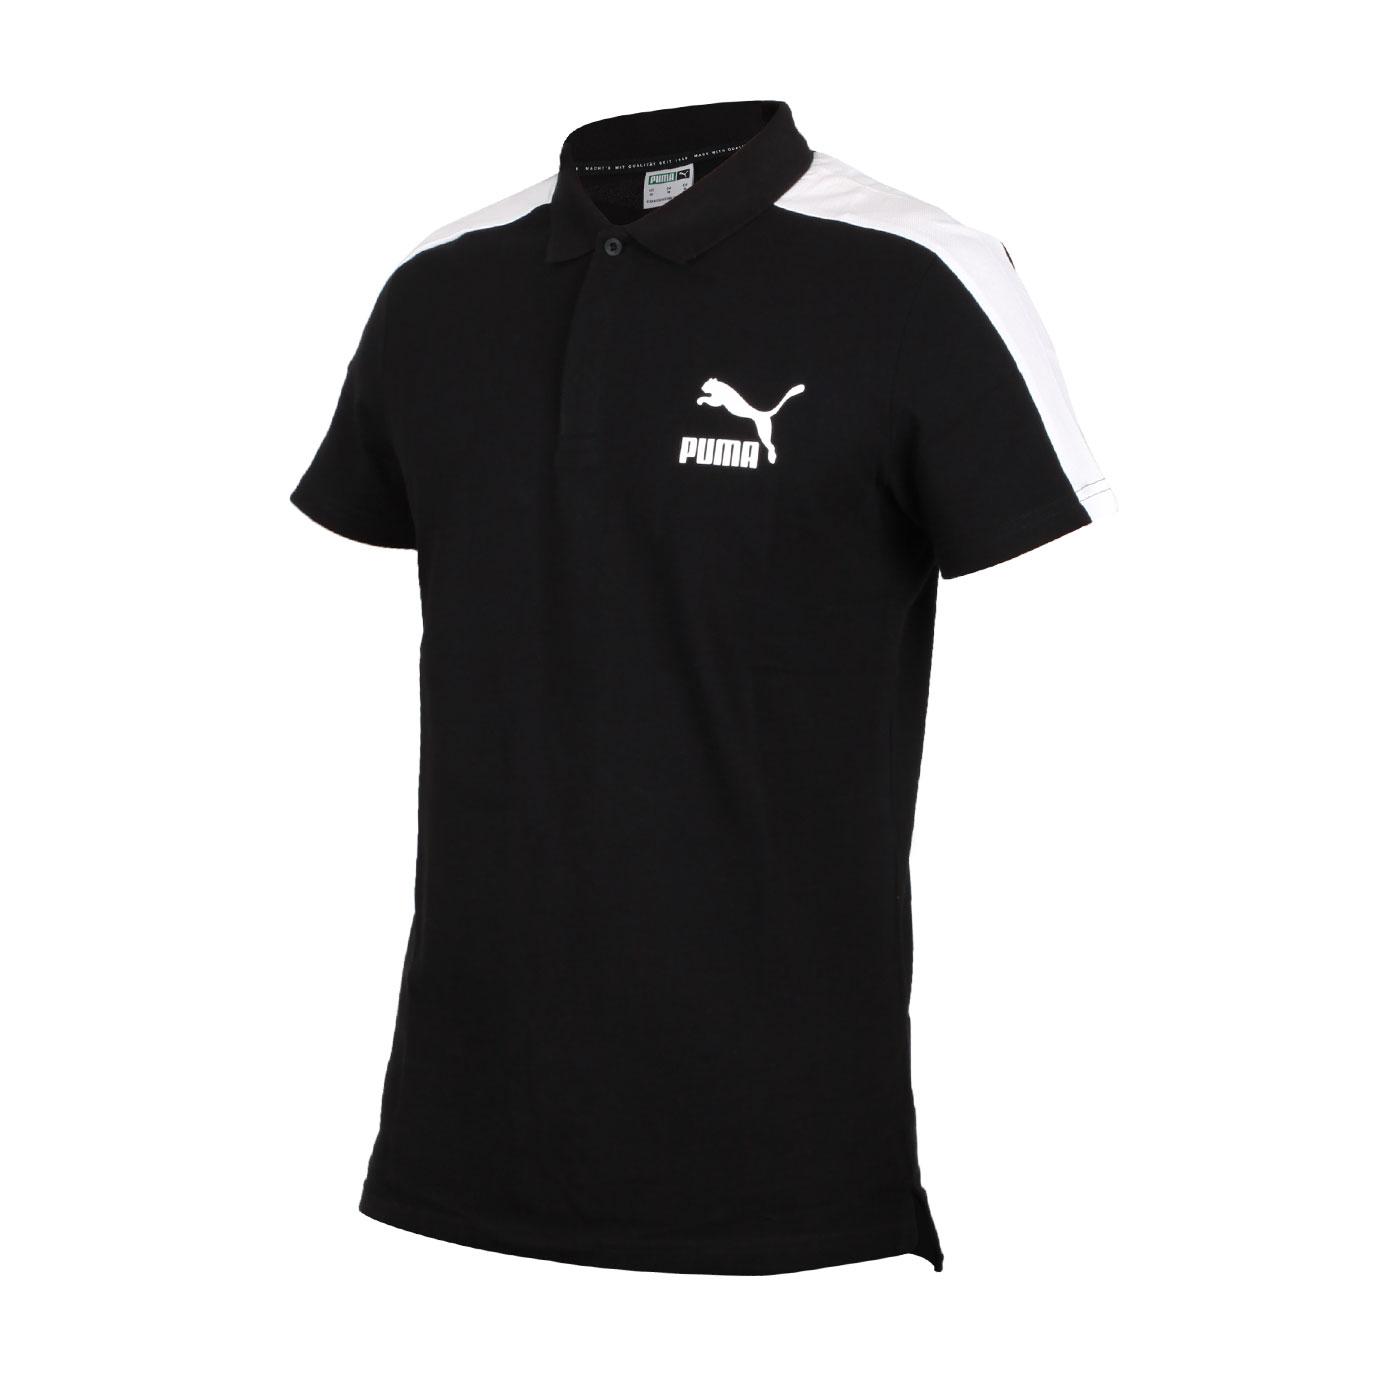 PUMA 男款短袖POLO衫 59644901 - 黑白